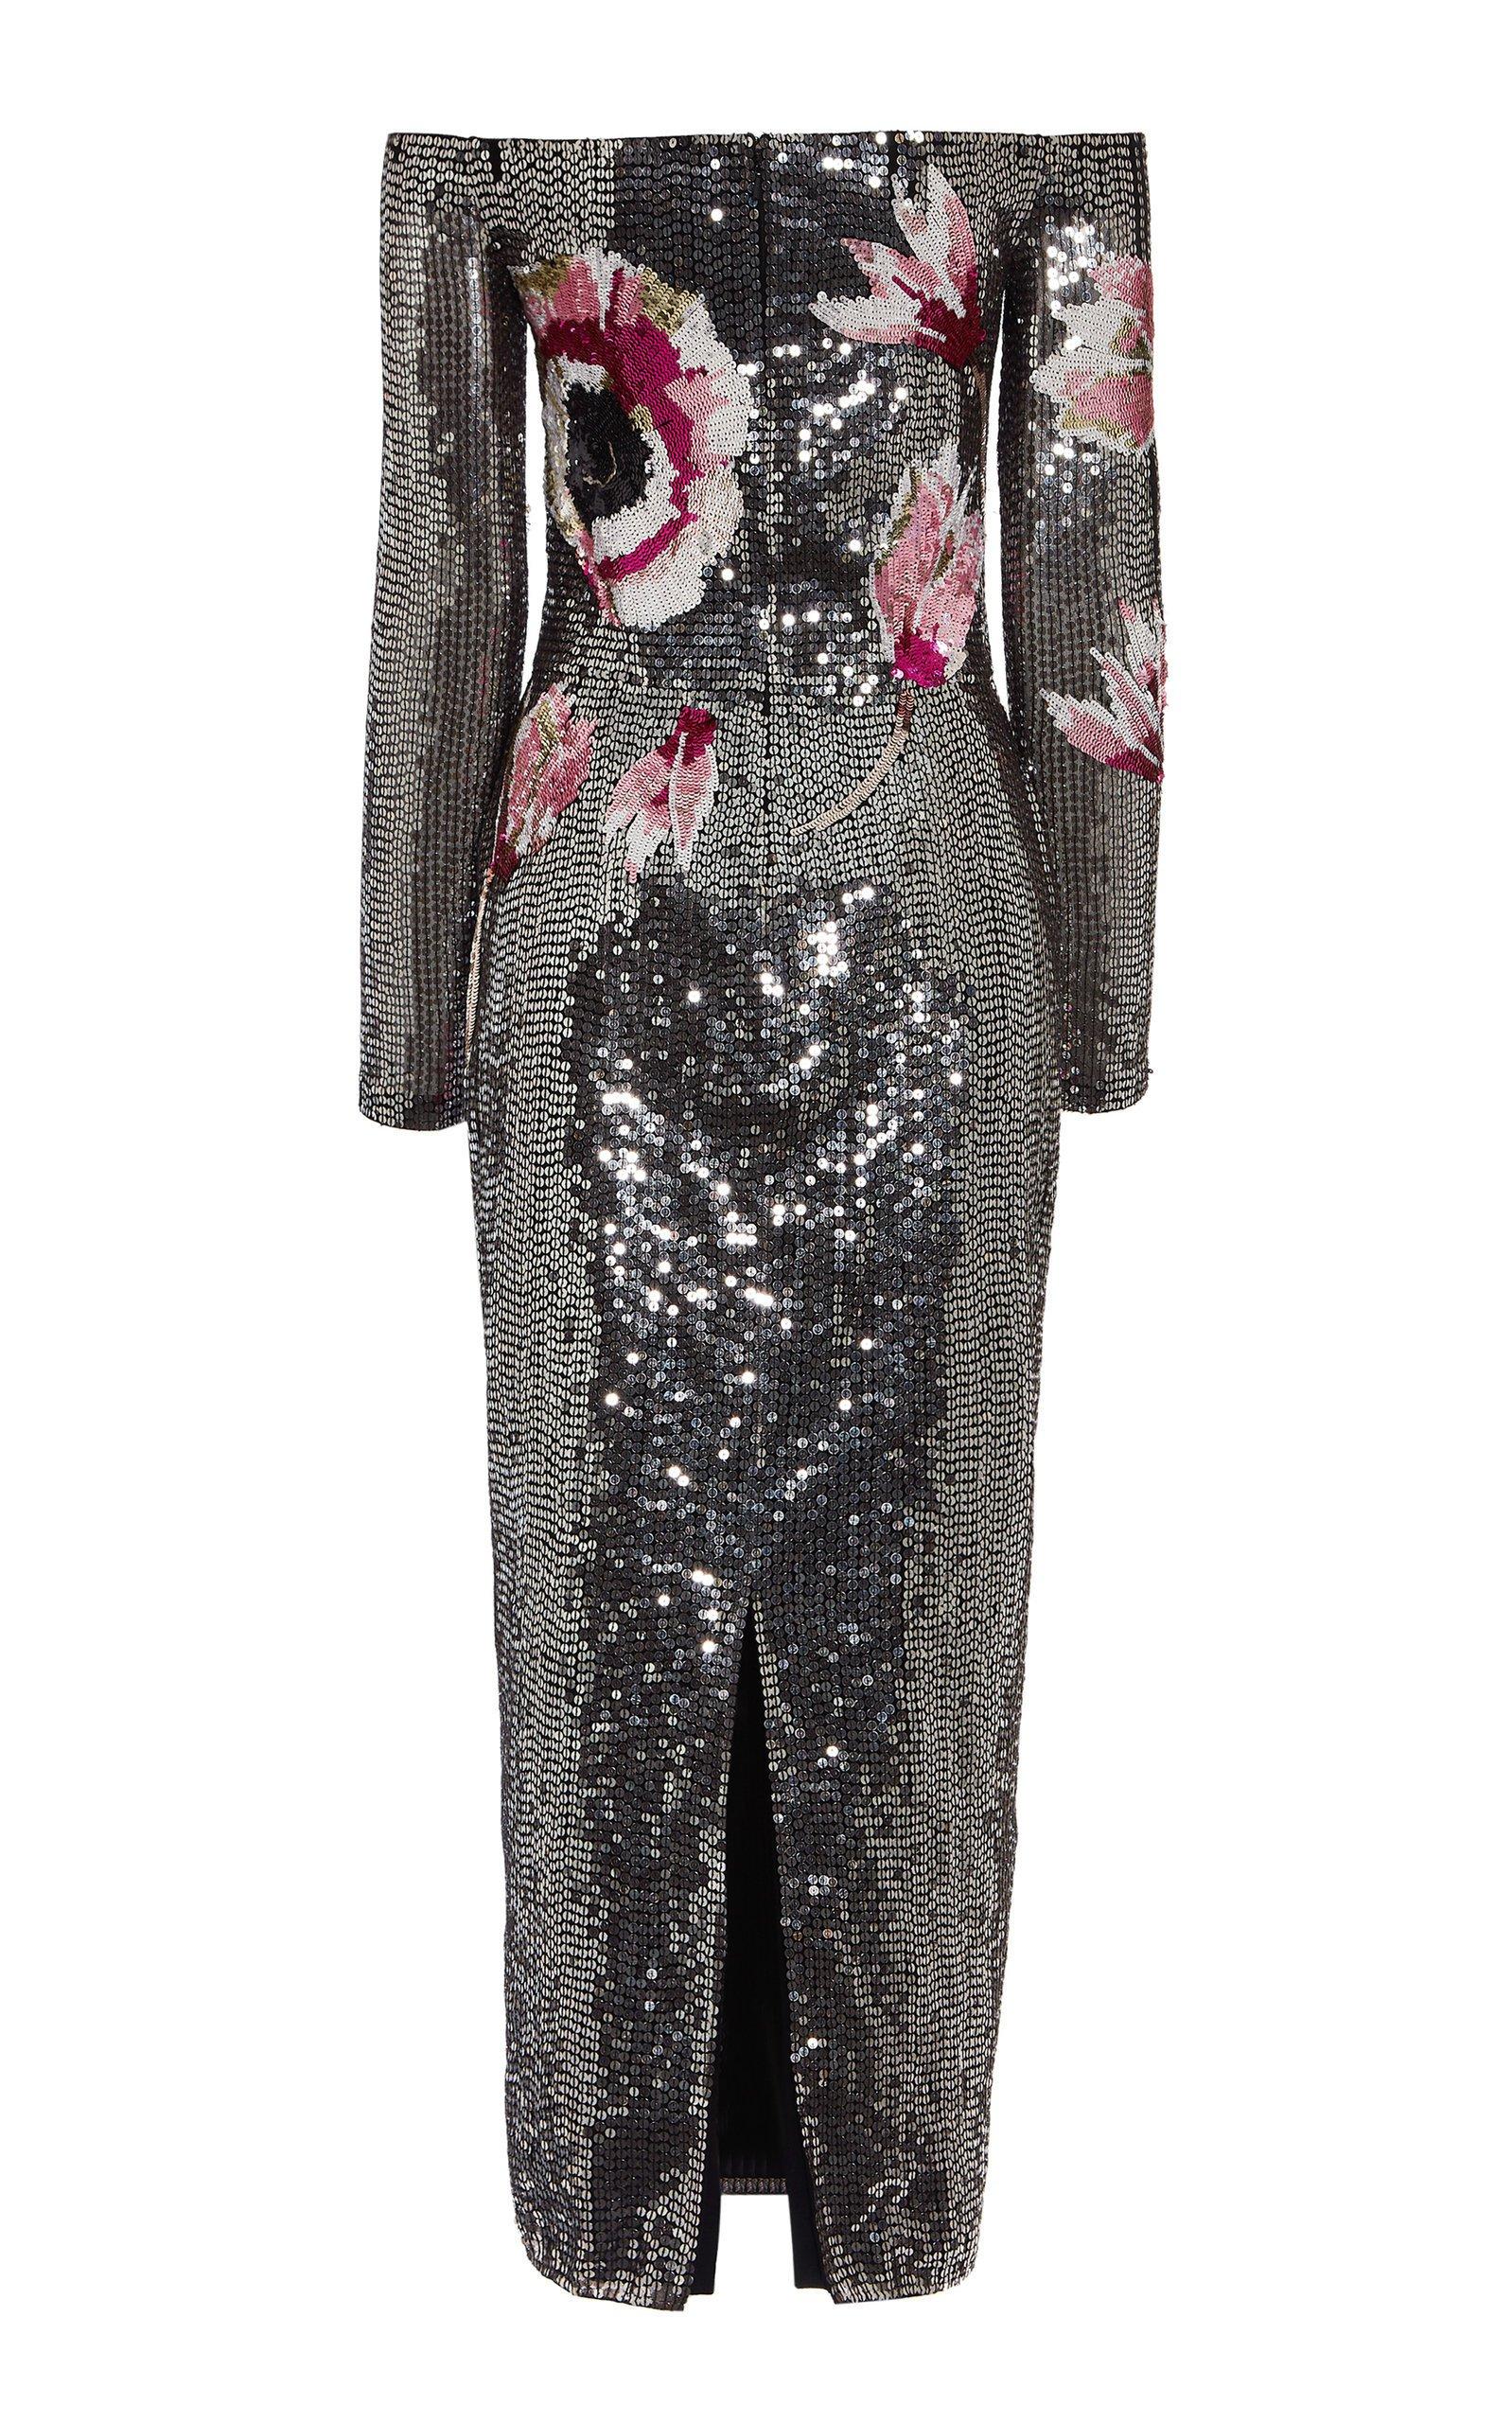 Temperley London Opia Off-The-Shoulder Dress